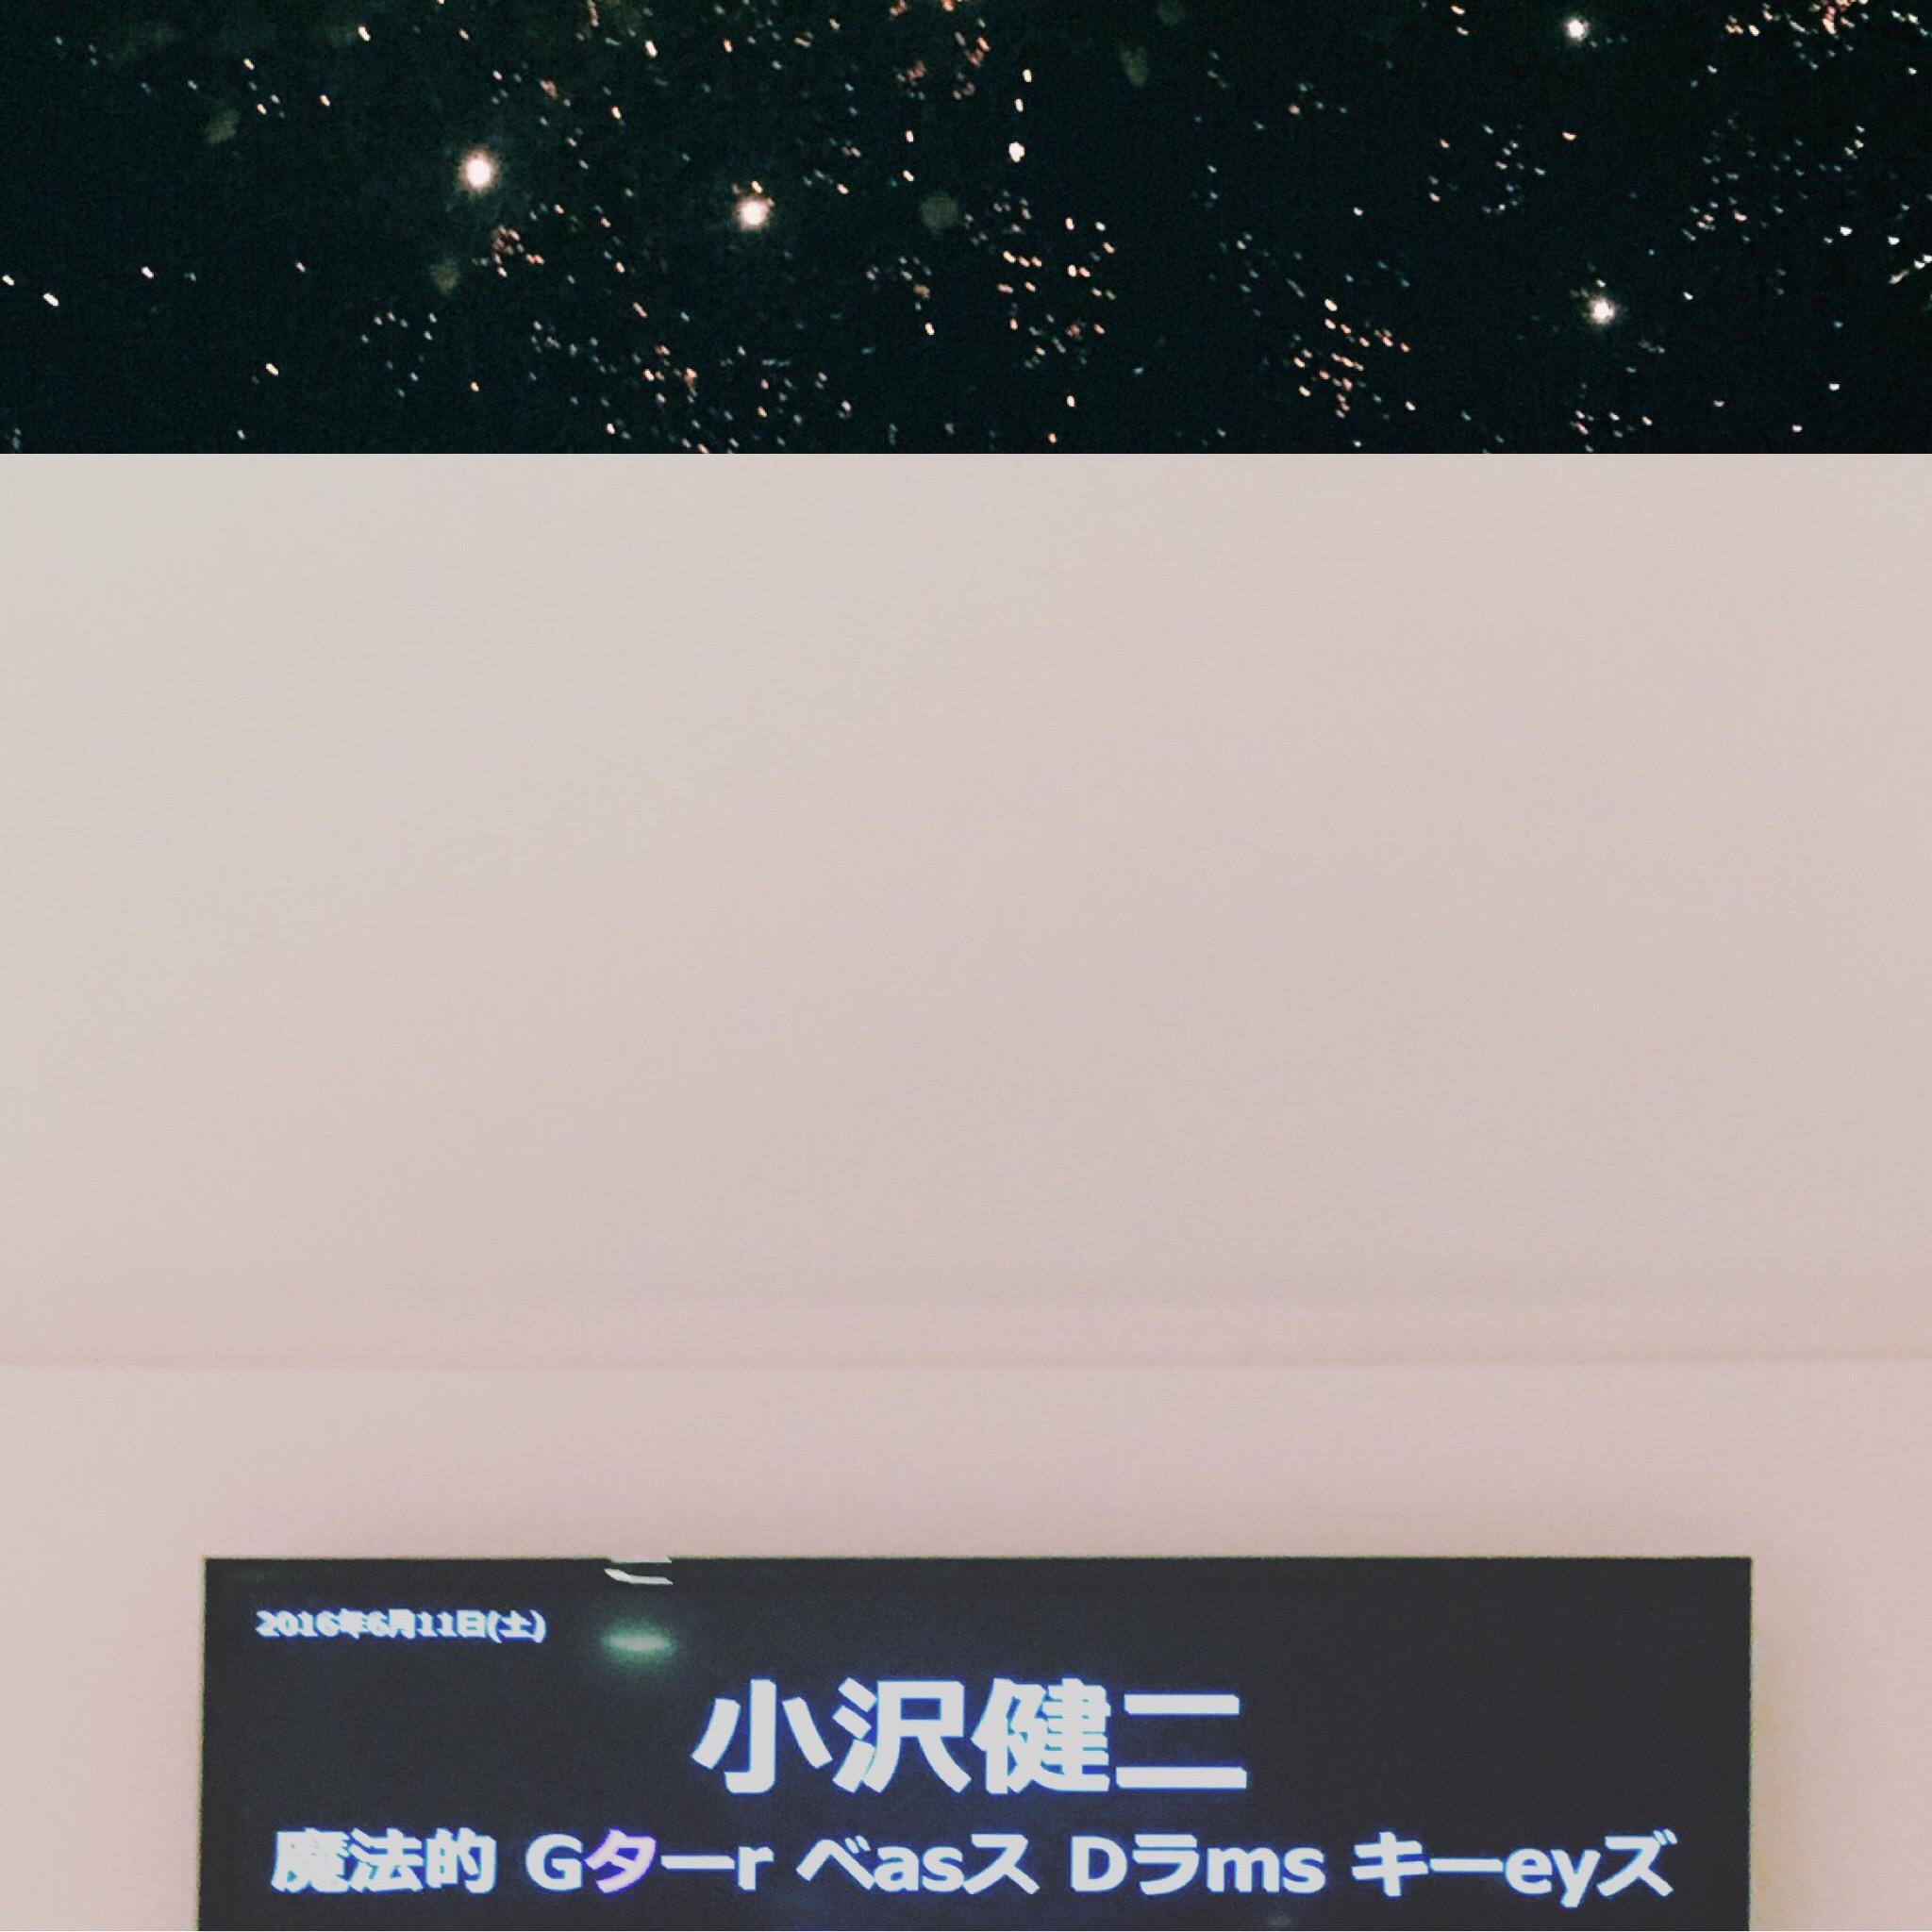 kenjiozawa live